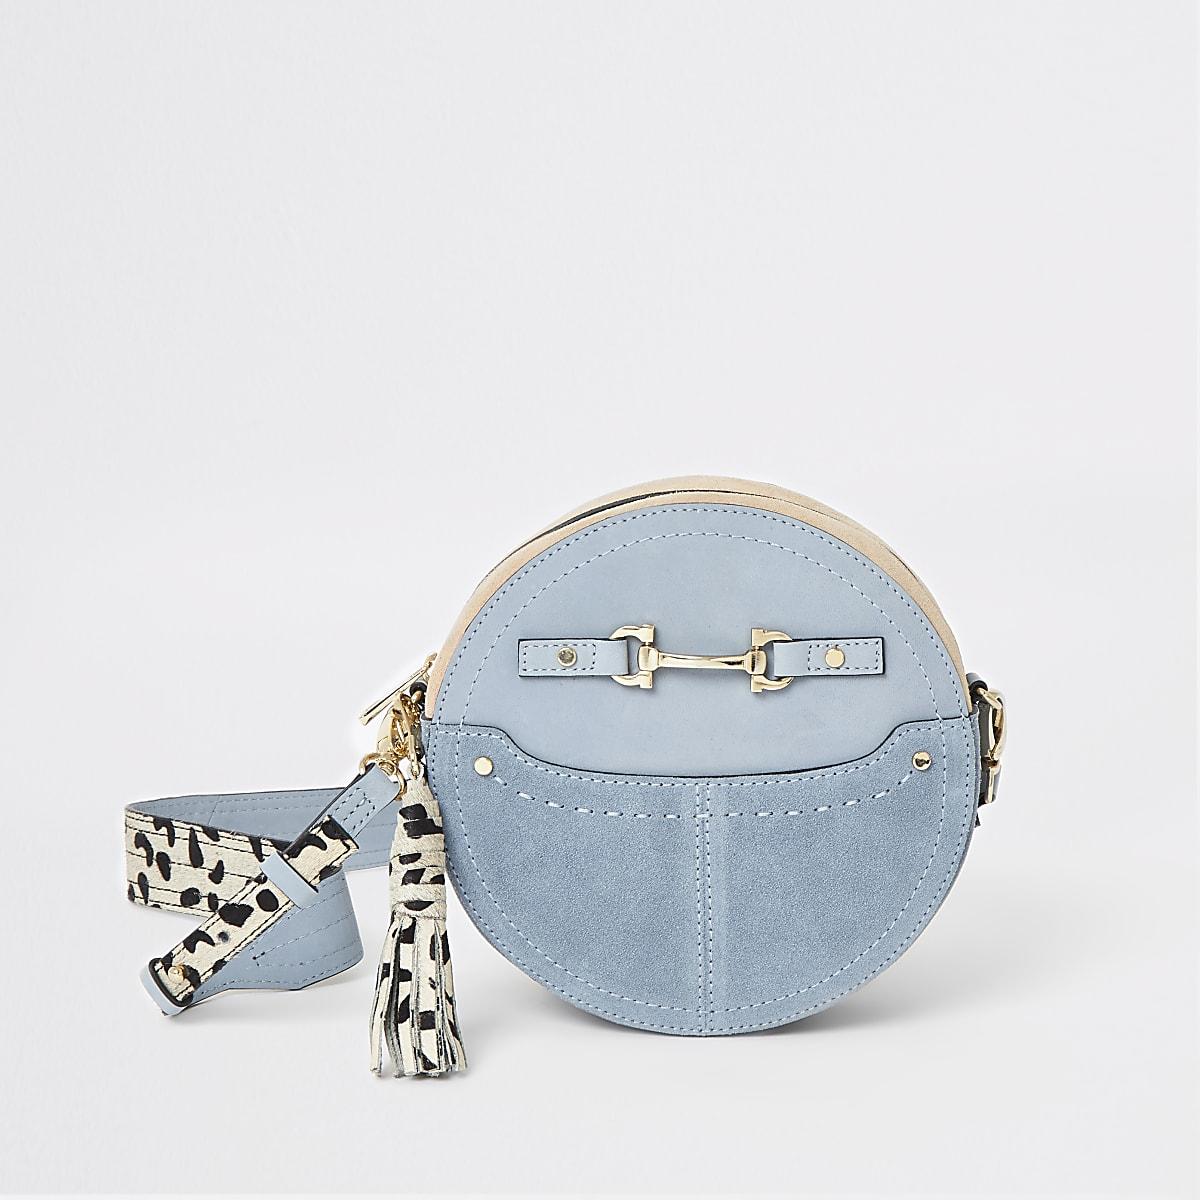 Light blue leather circle cross body bag